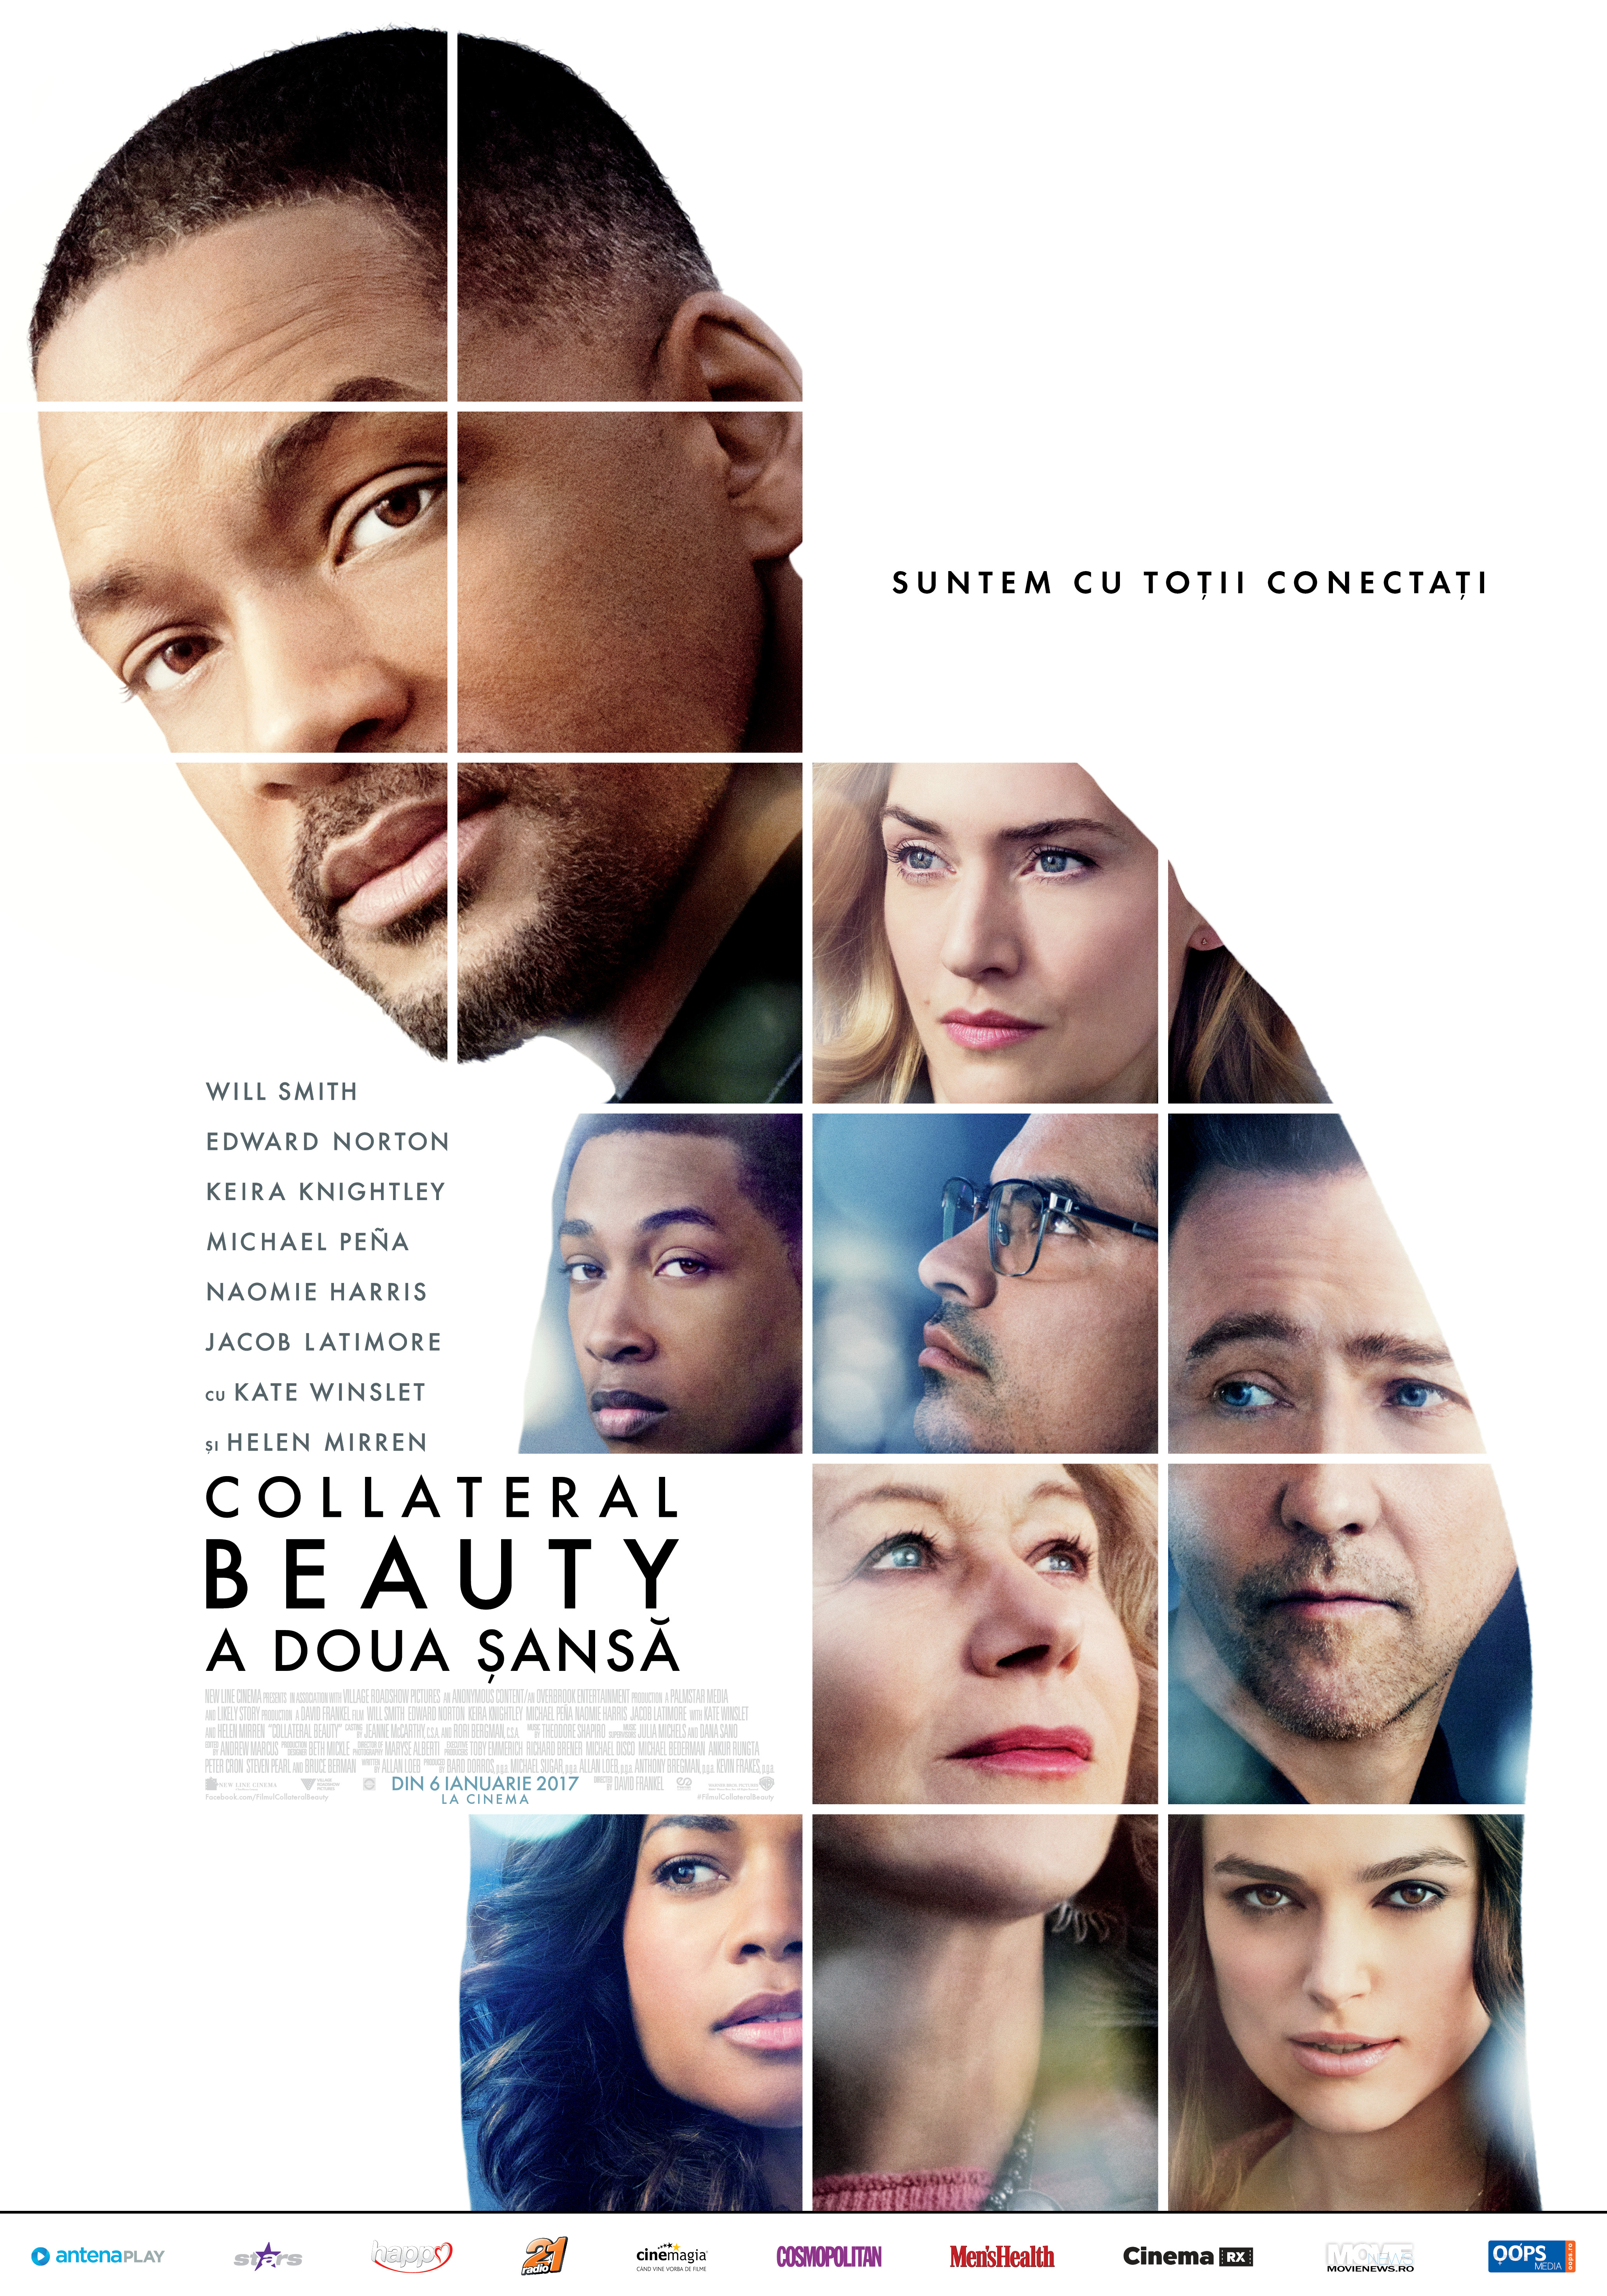 Collateral Beauty: A doua șansă (2016) Collateral-beauty-537499l